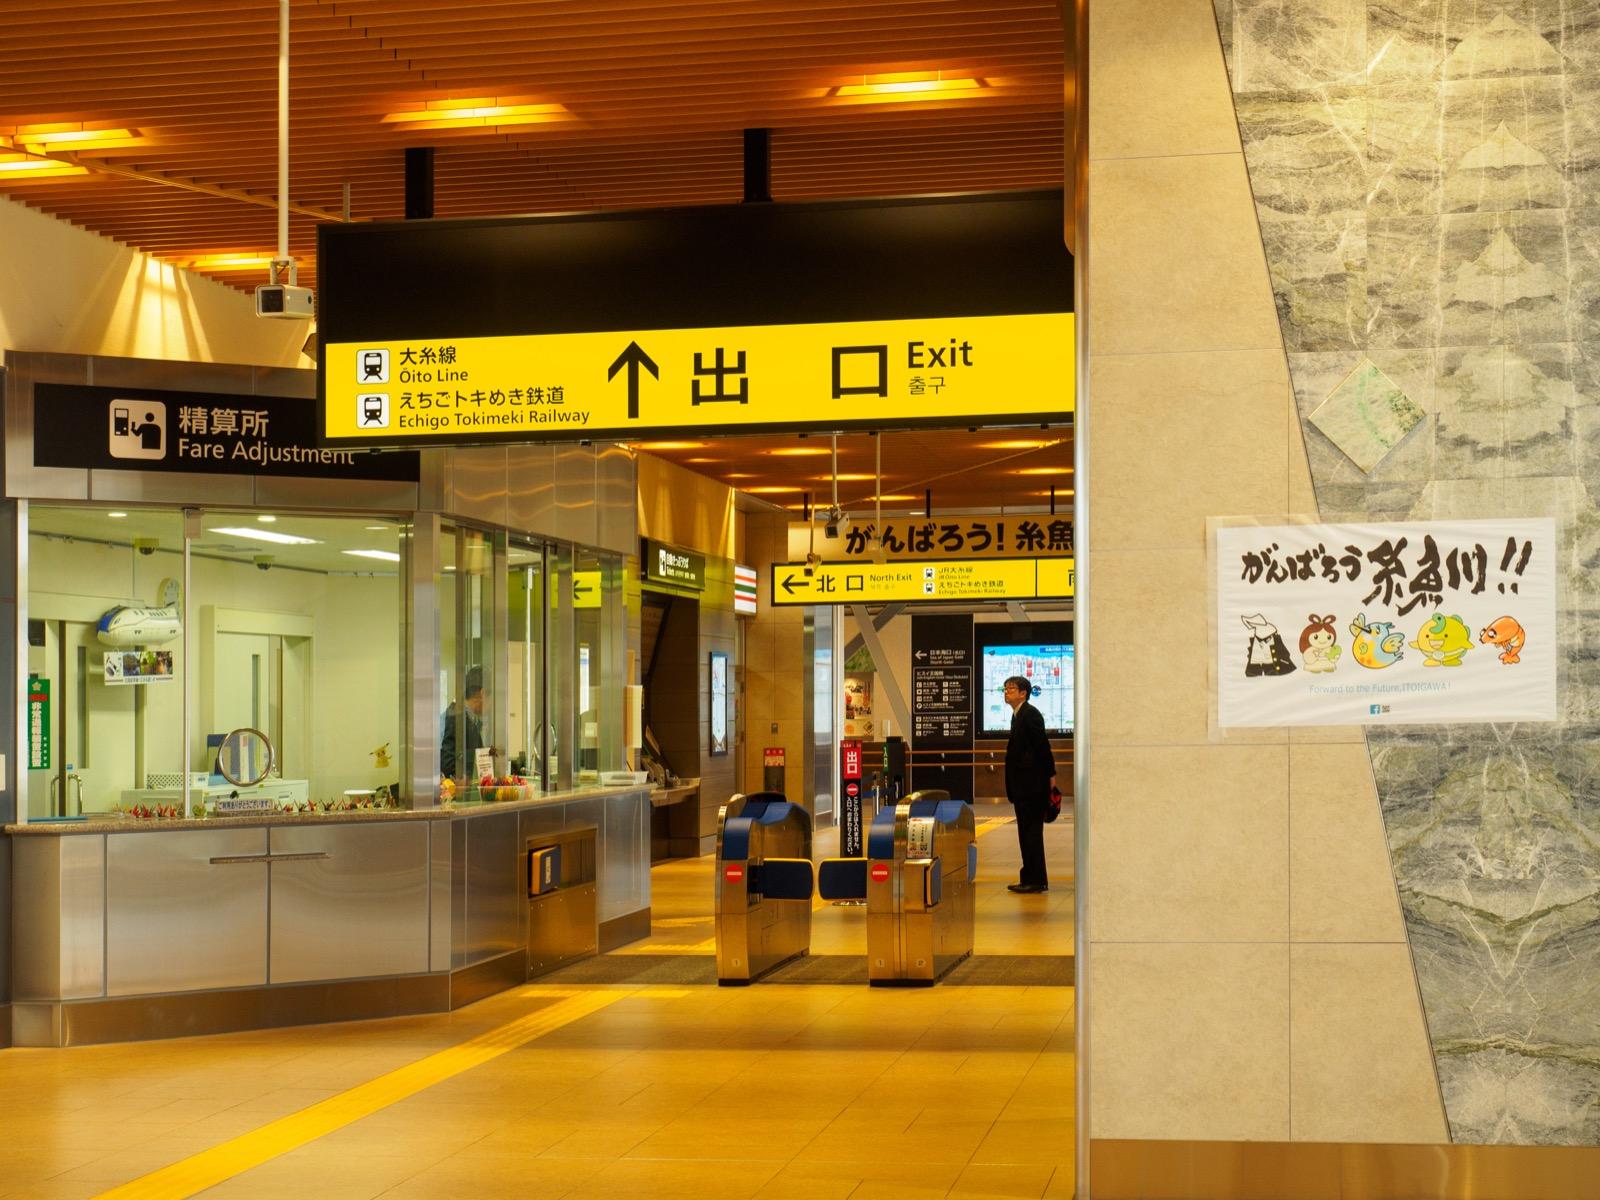 北陸新幹線糸魚川駅の改札口(2017年4月)